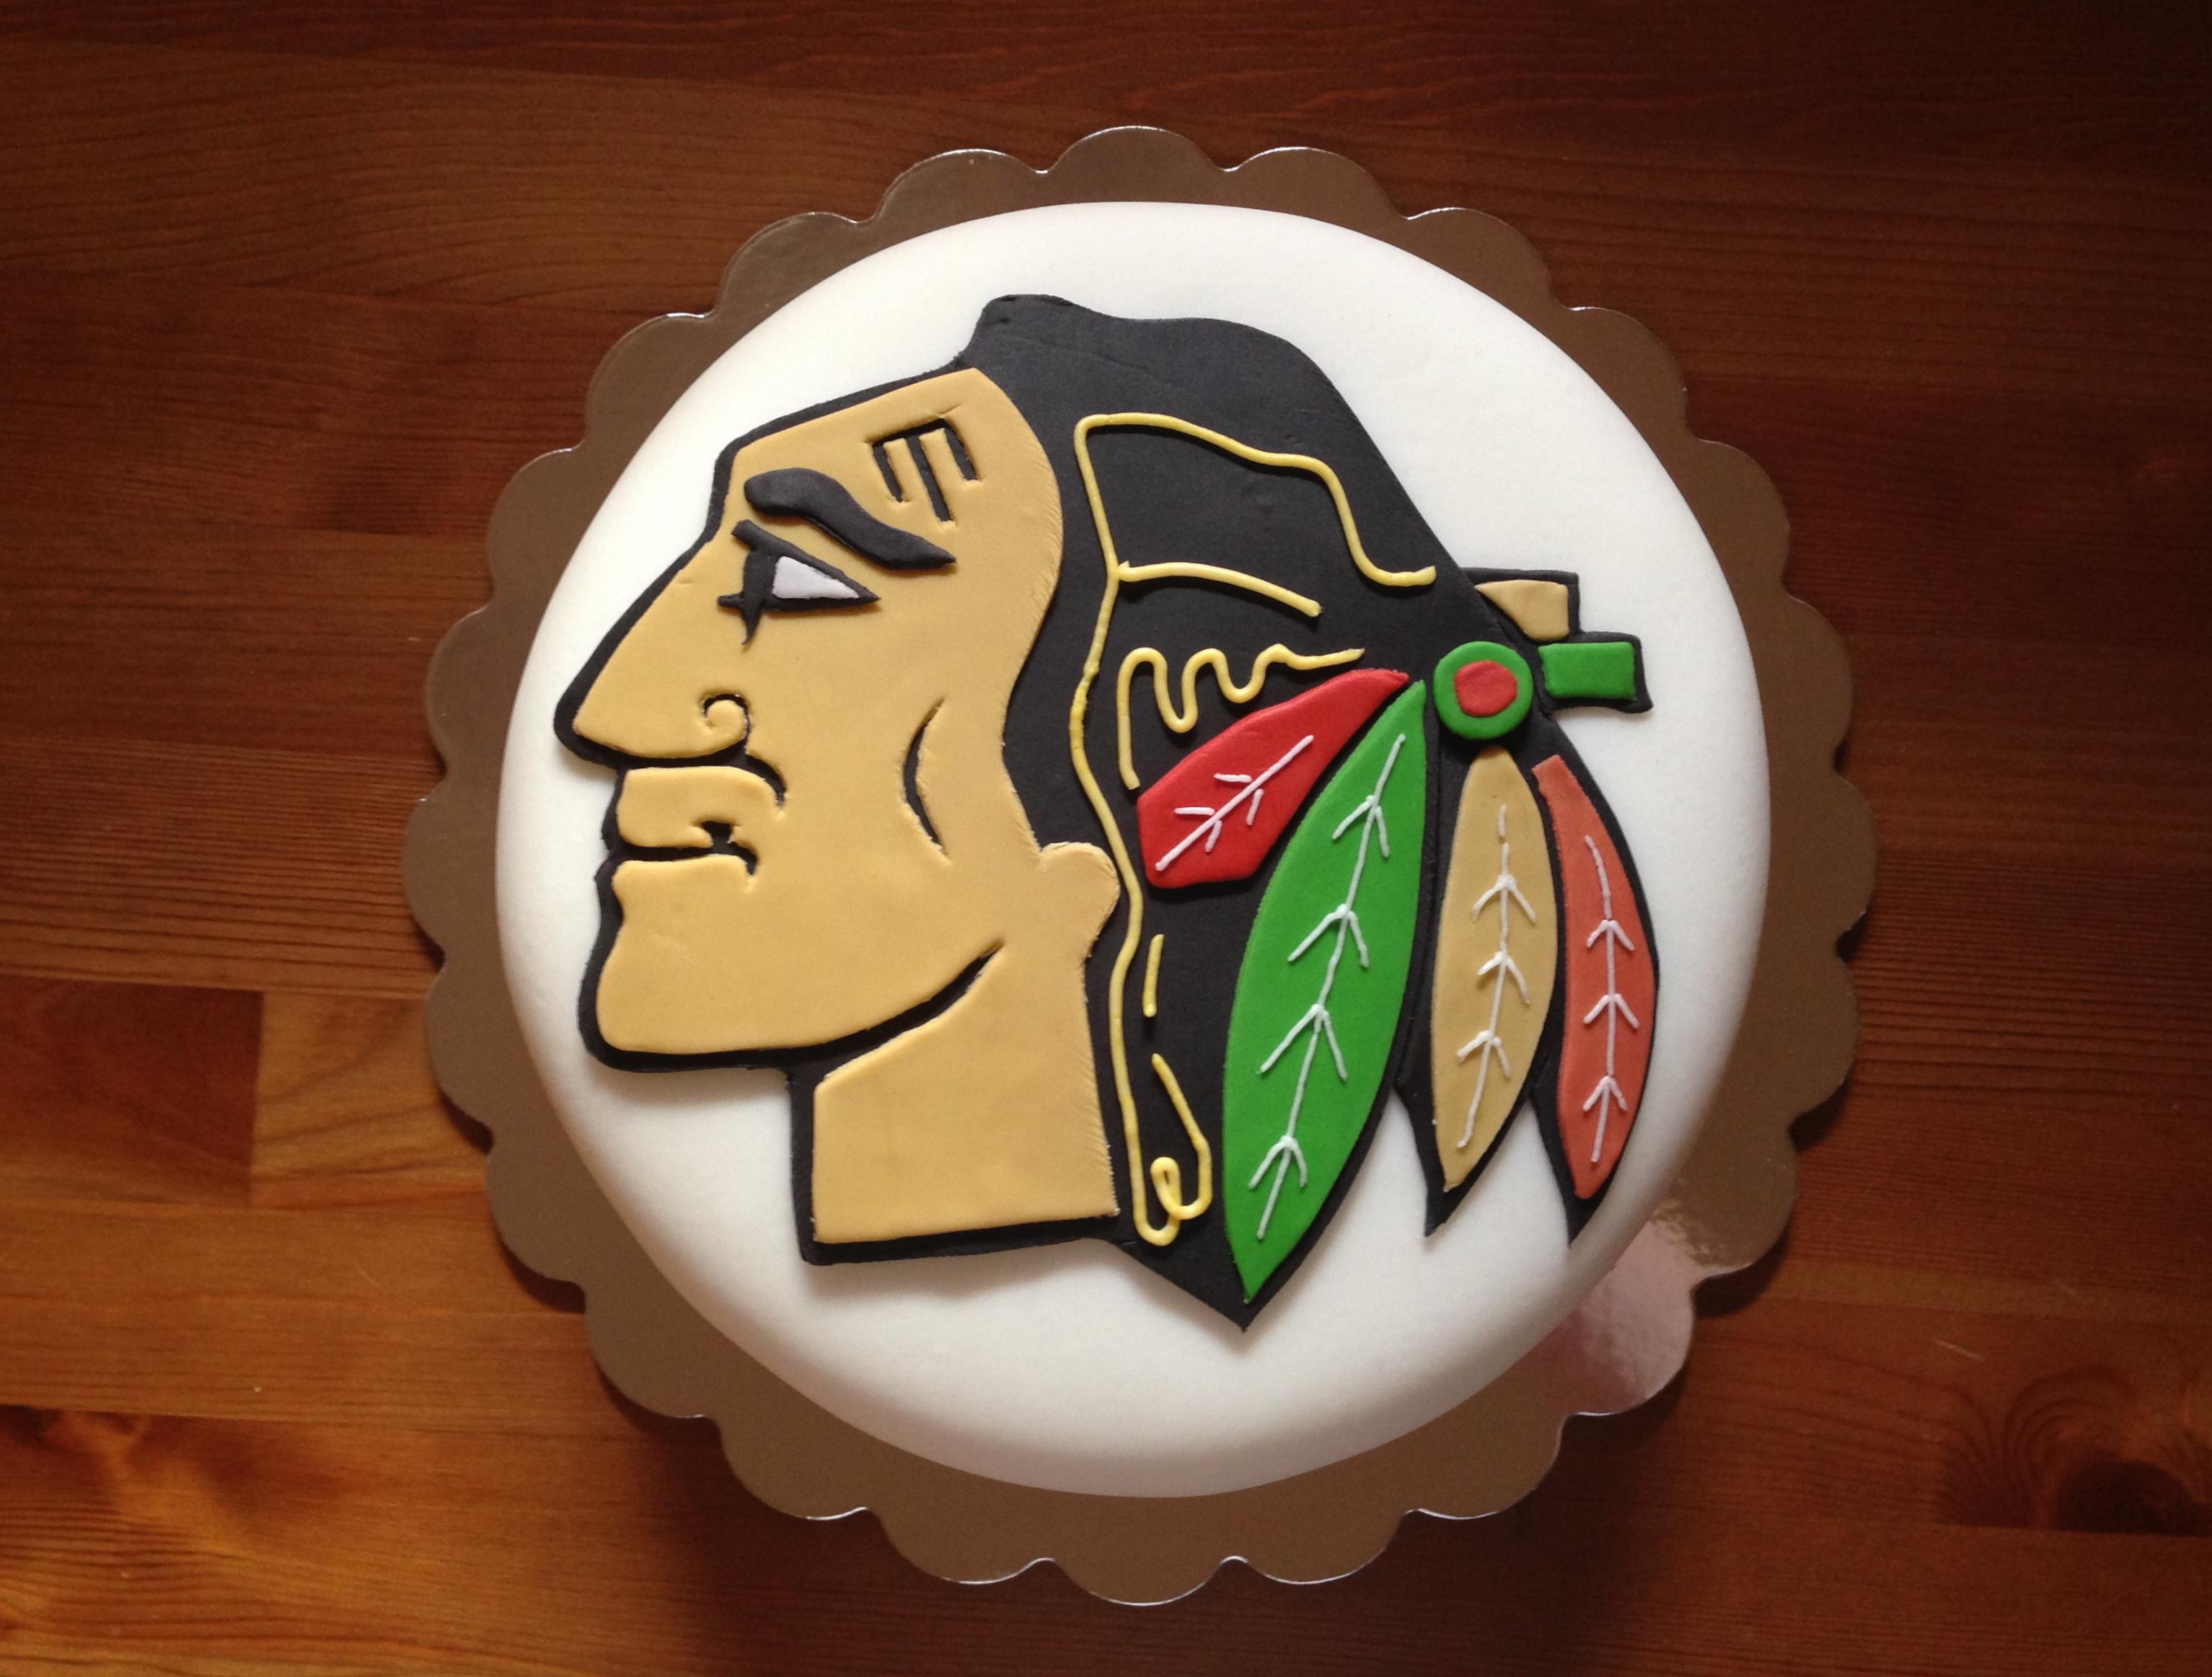 Chicago Blackhawks cake Meloda